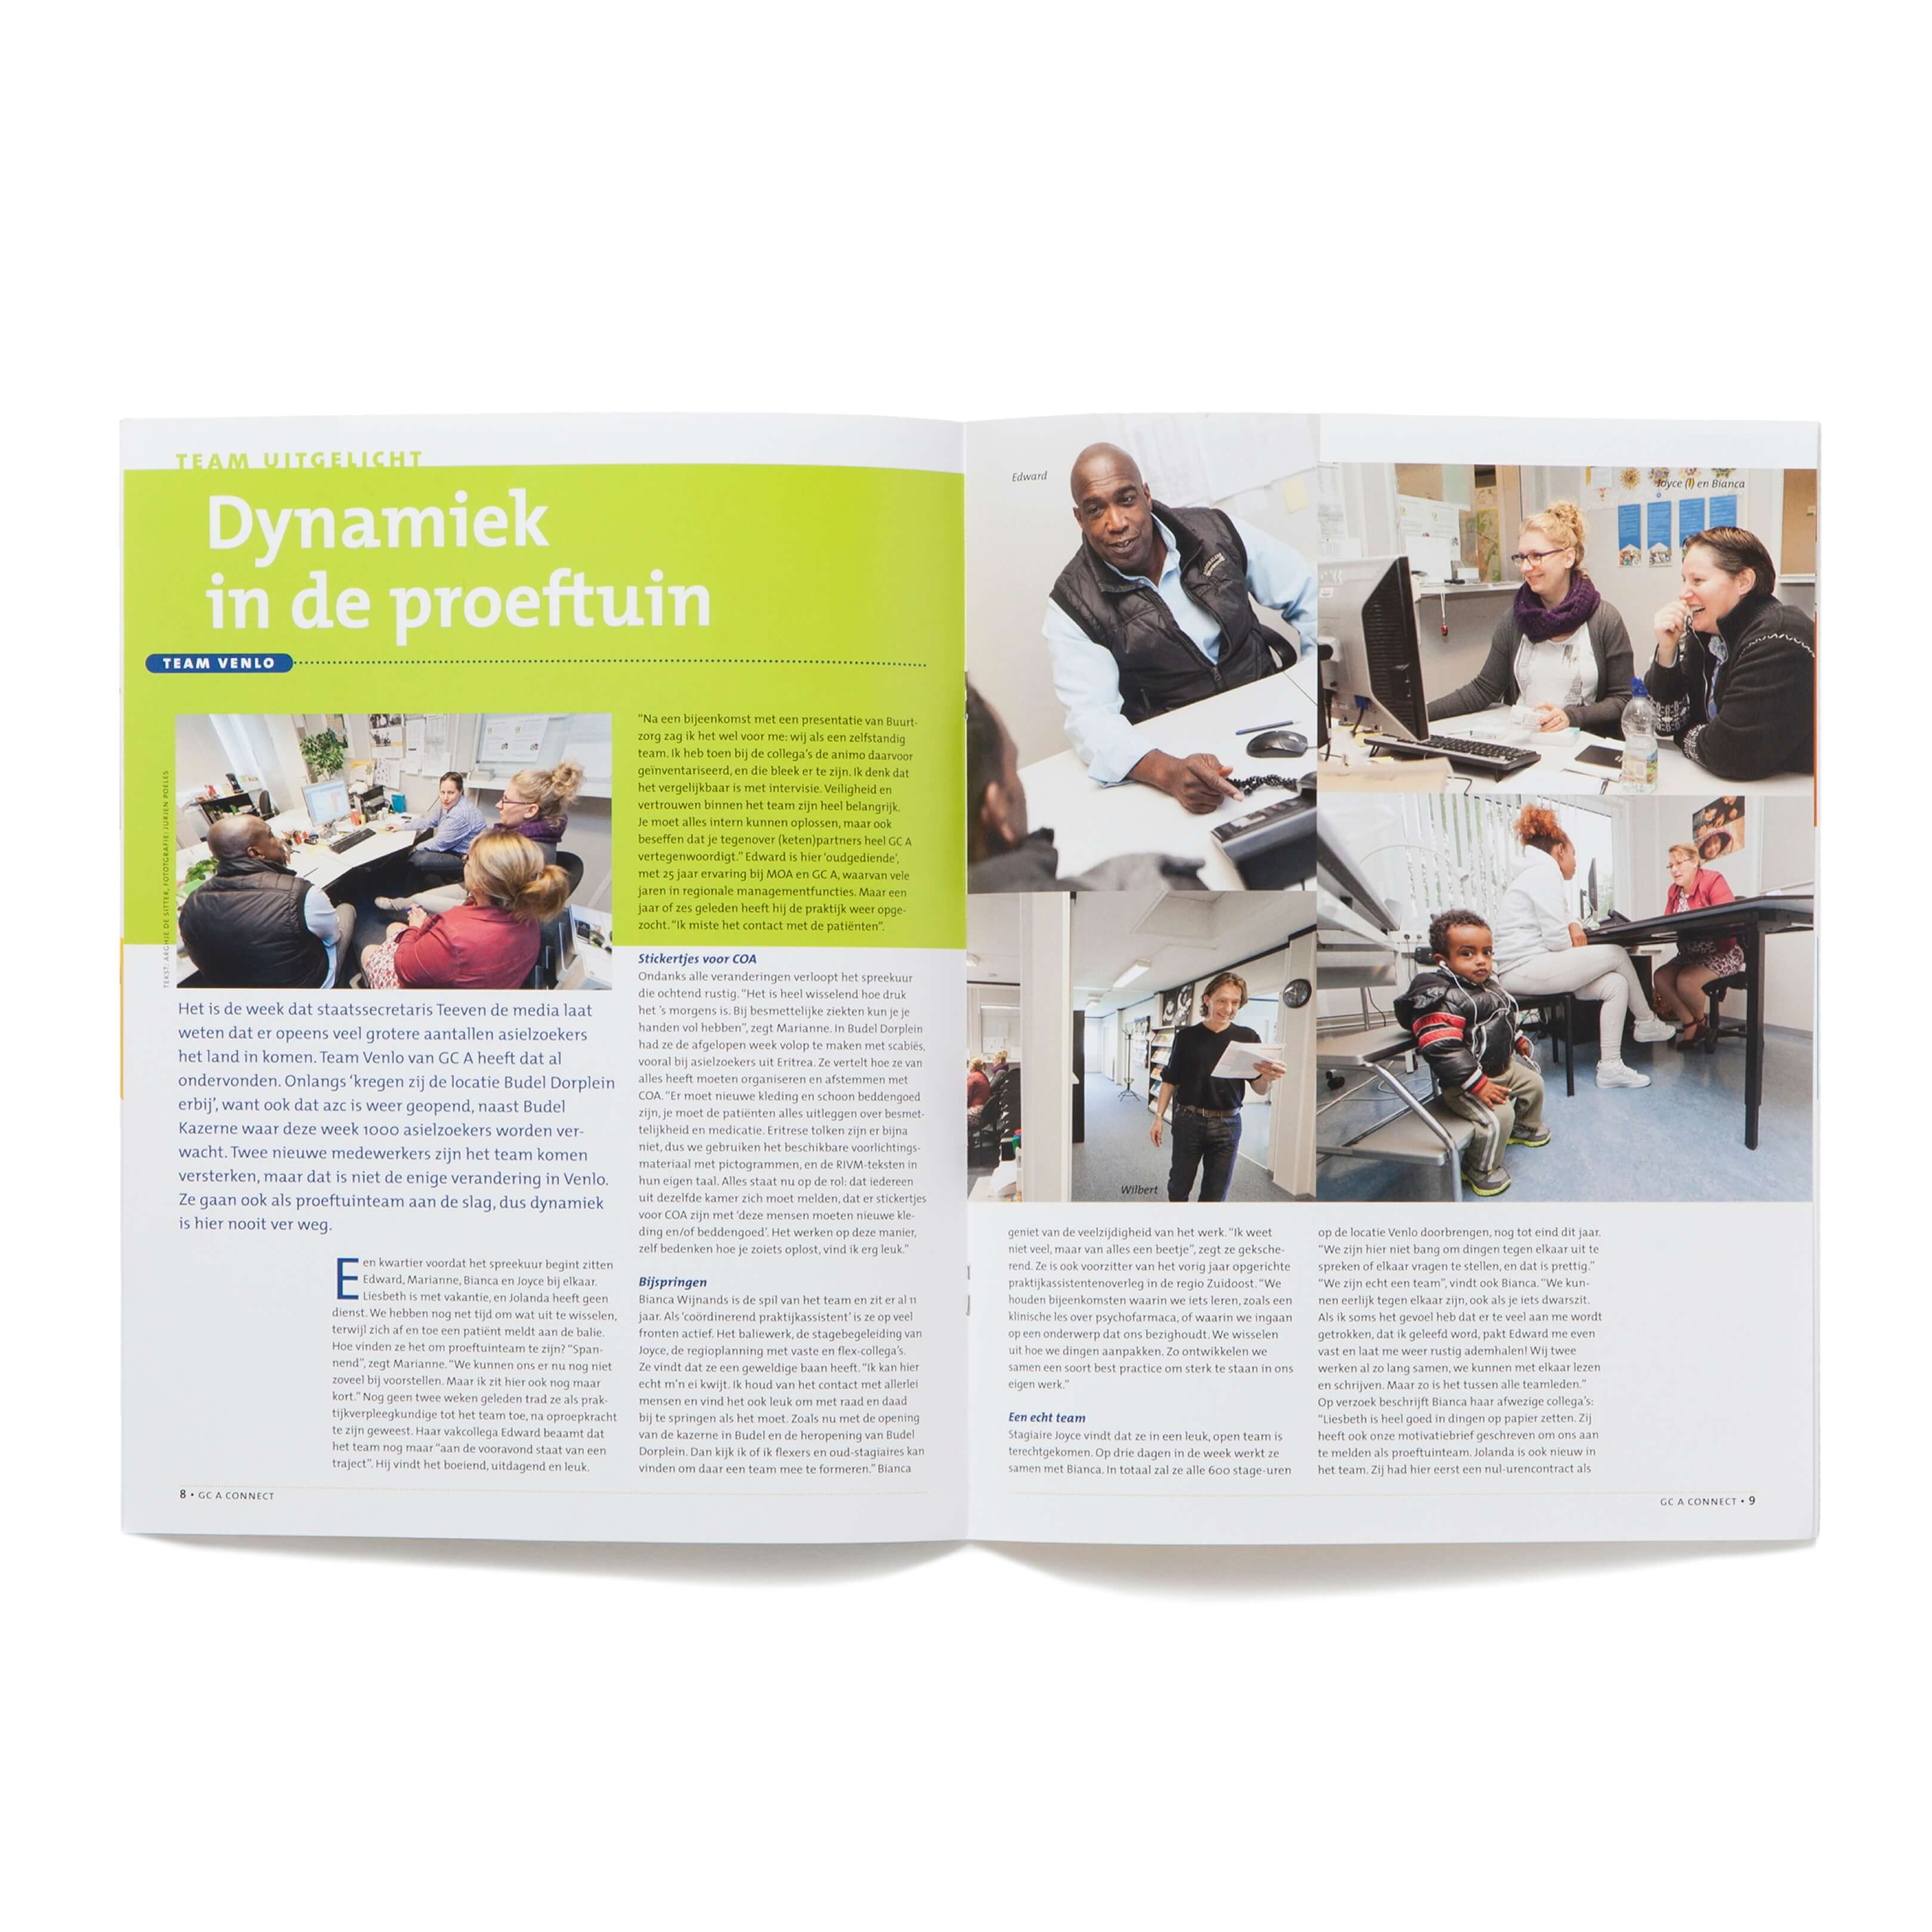 Jurjen Poeles Fotografie magazine GCA Connect vluchteling Gezondheids Centrum Asielzoekers medisch zorg team portret cover reportage